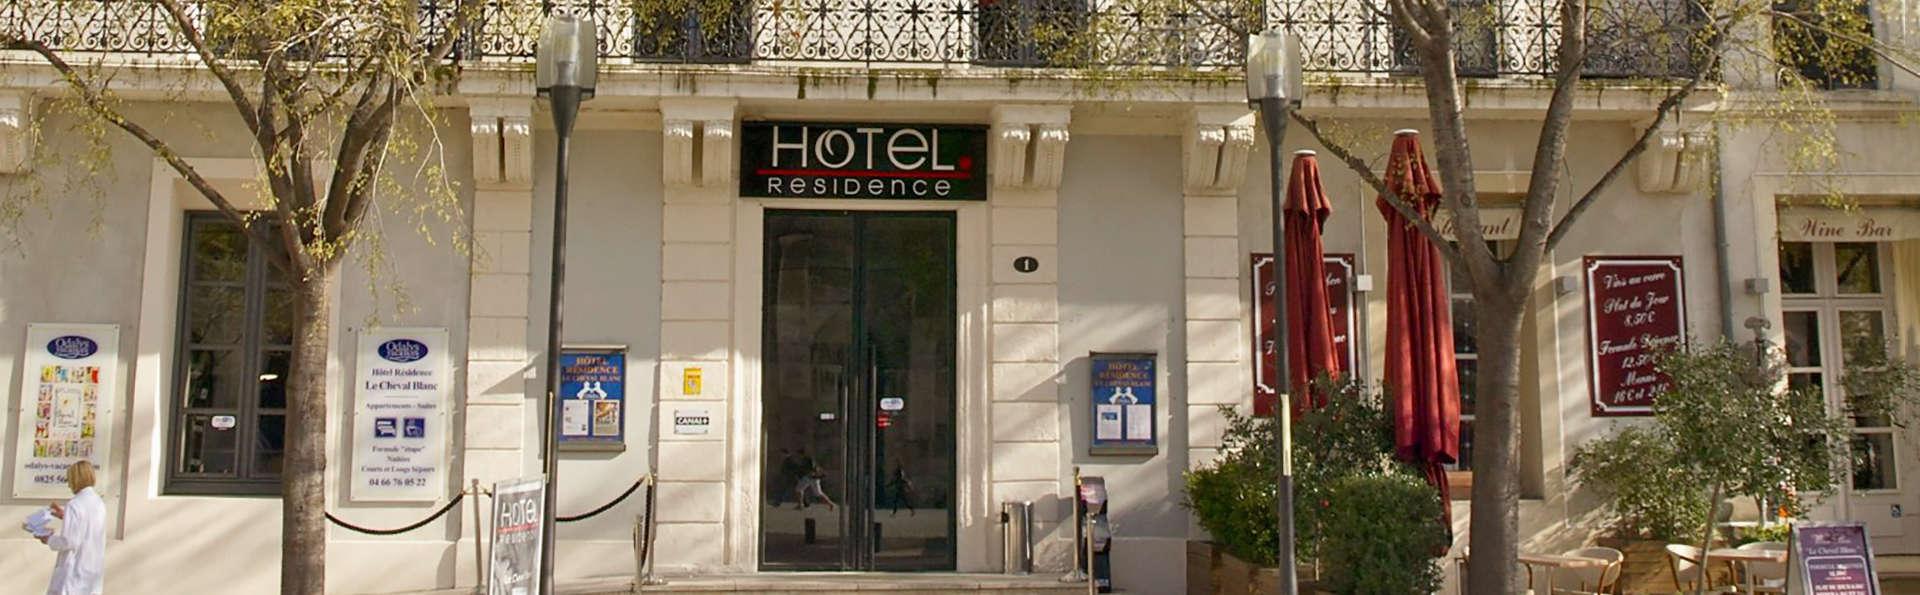 Appart'hôtel Odalys Le Cheval Blanc - EDIT_Fachada1.jpg